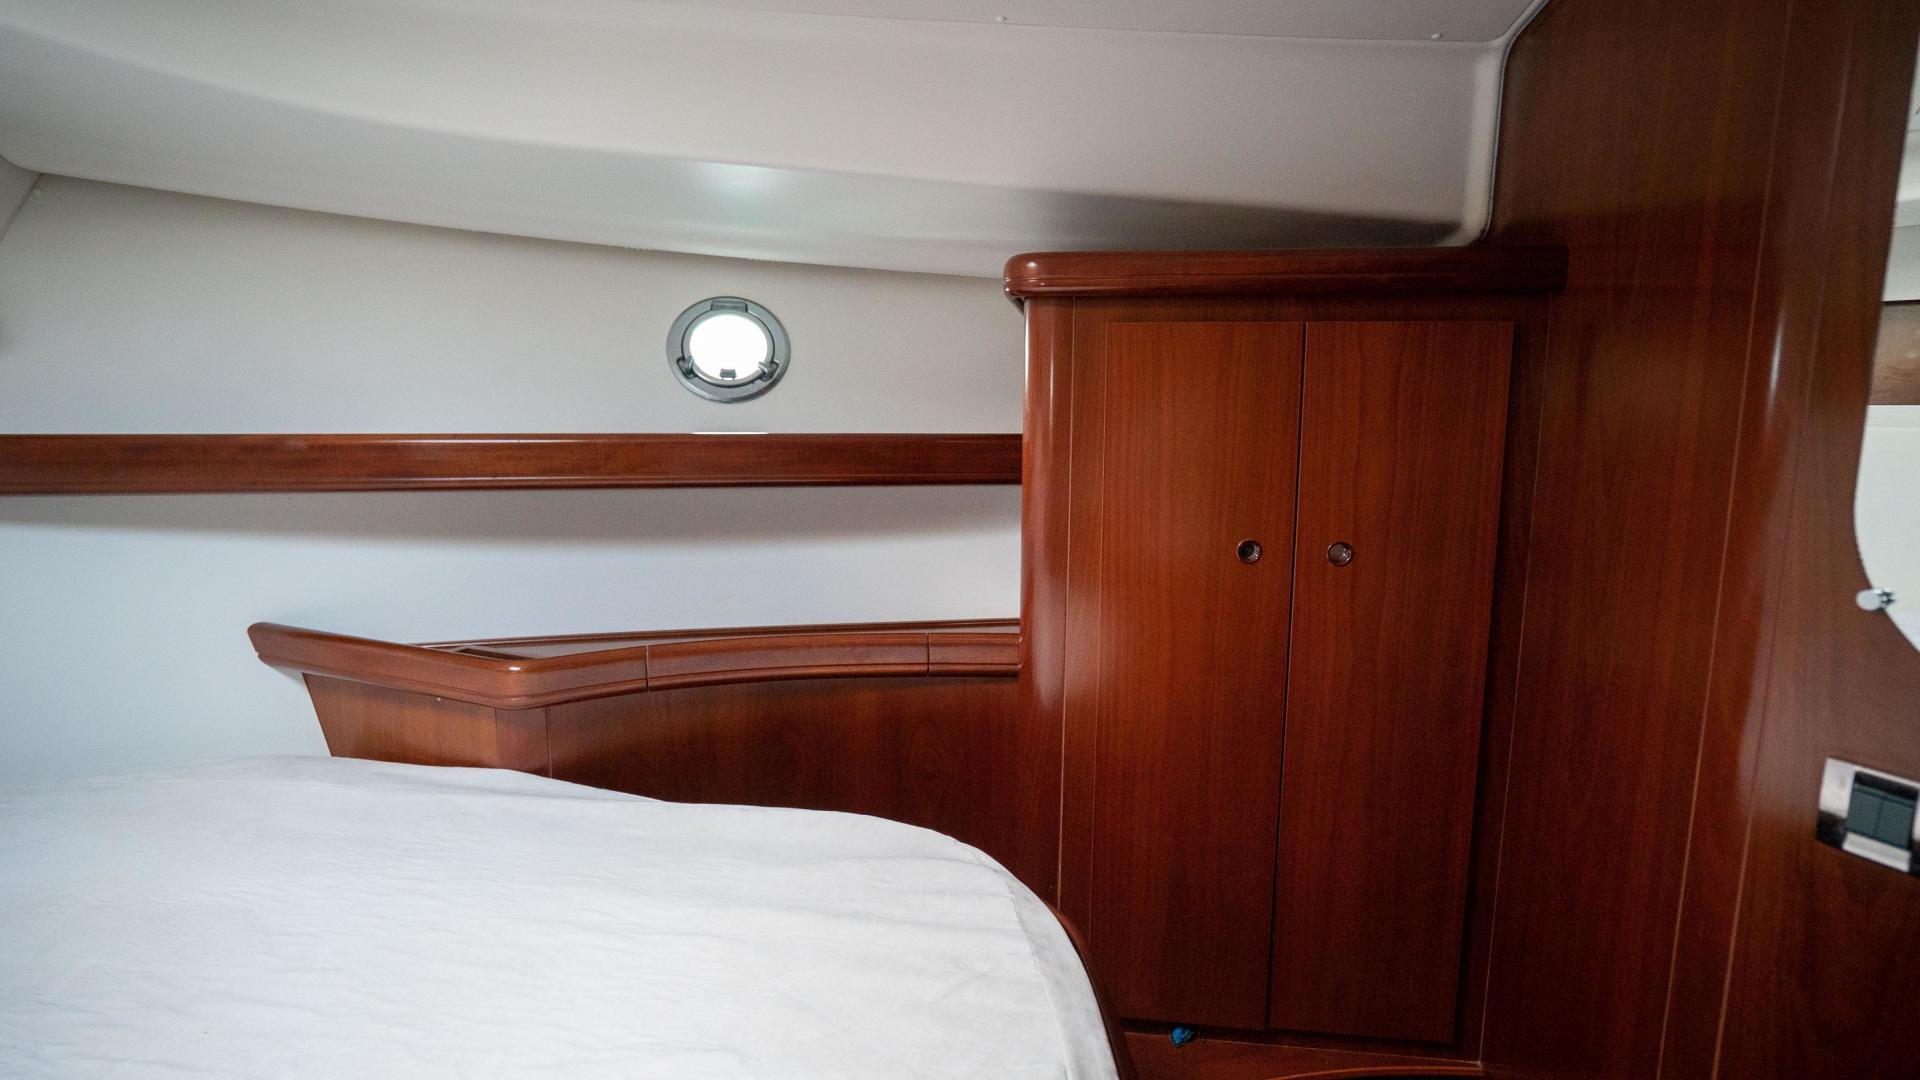 Beneteau-Swift Trawler 2008-Amadeus Acapulco-Mexico-1487089 | Thumbnail